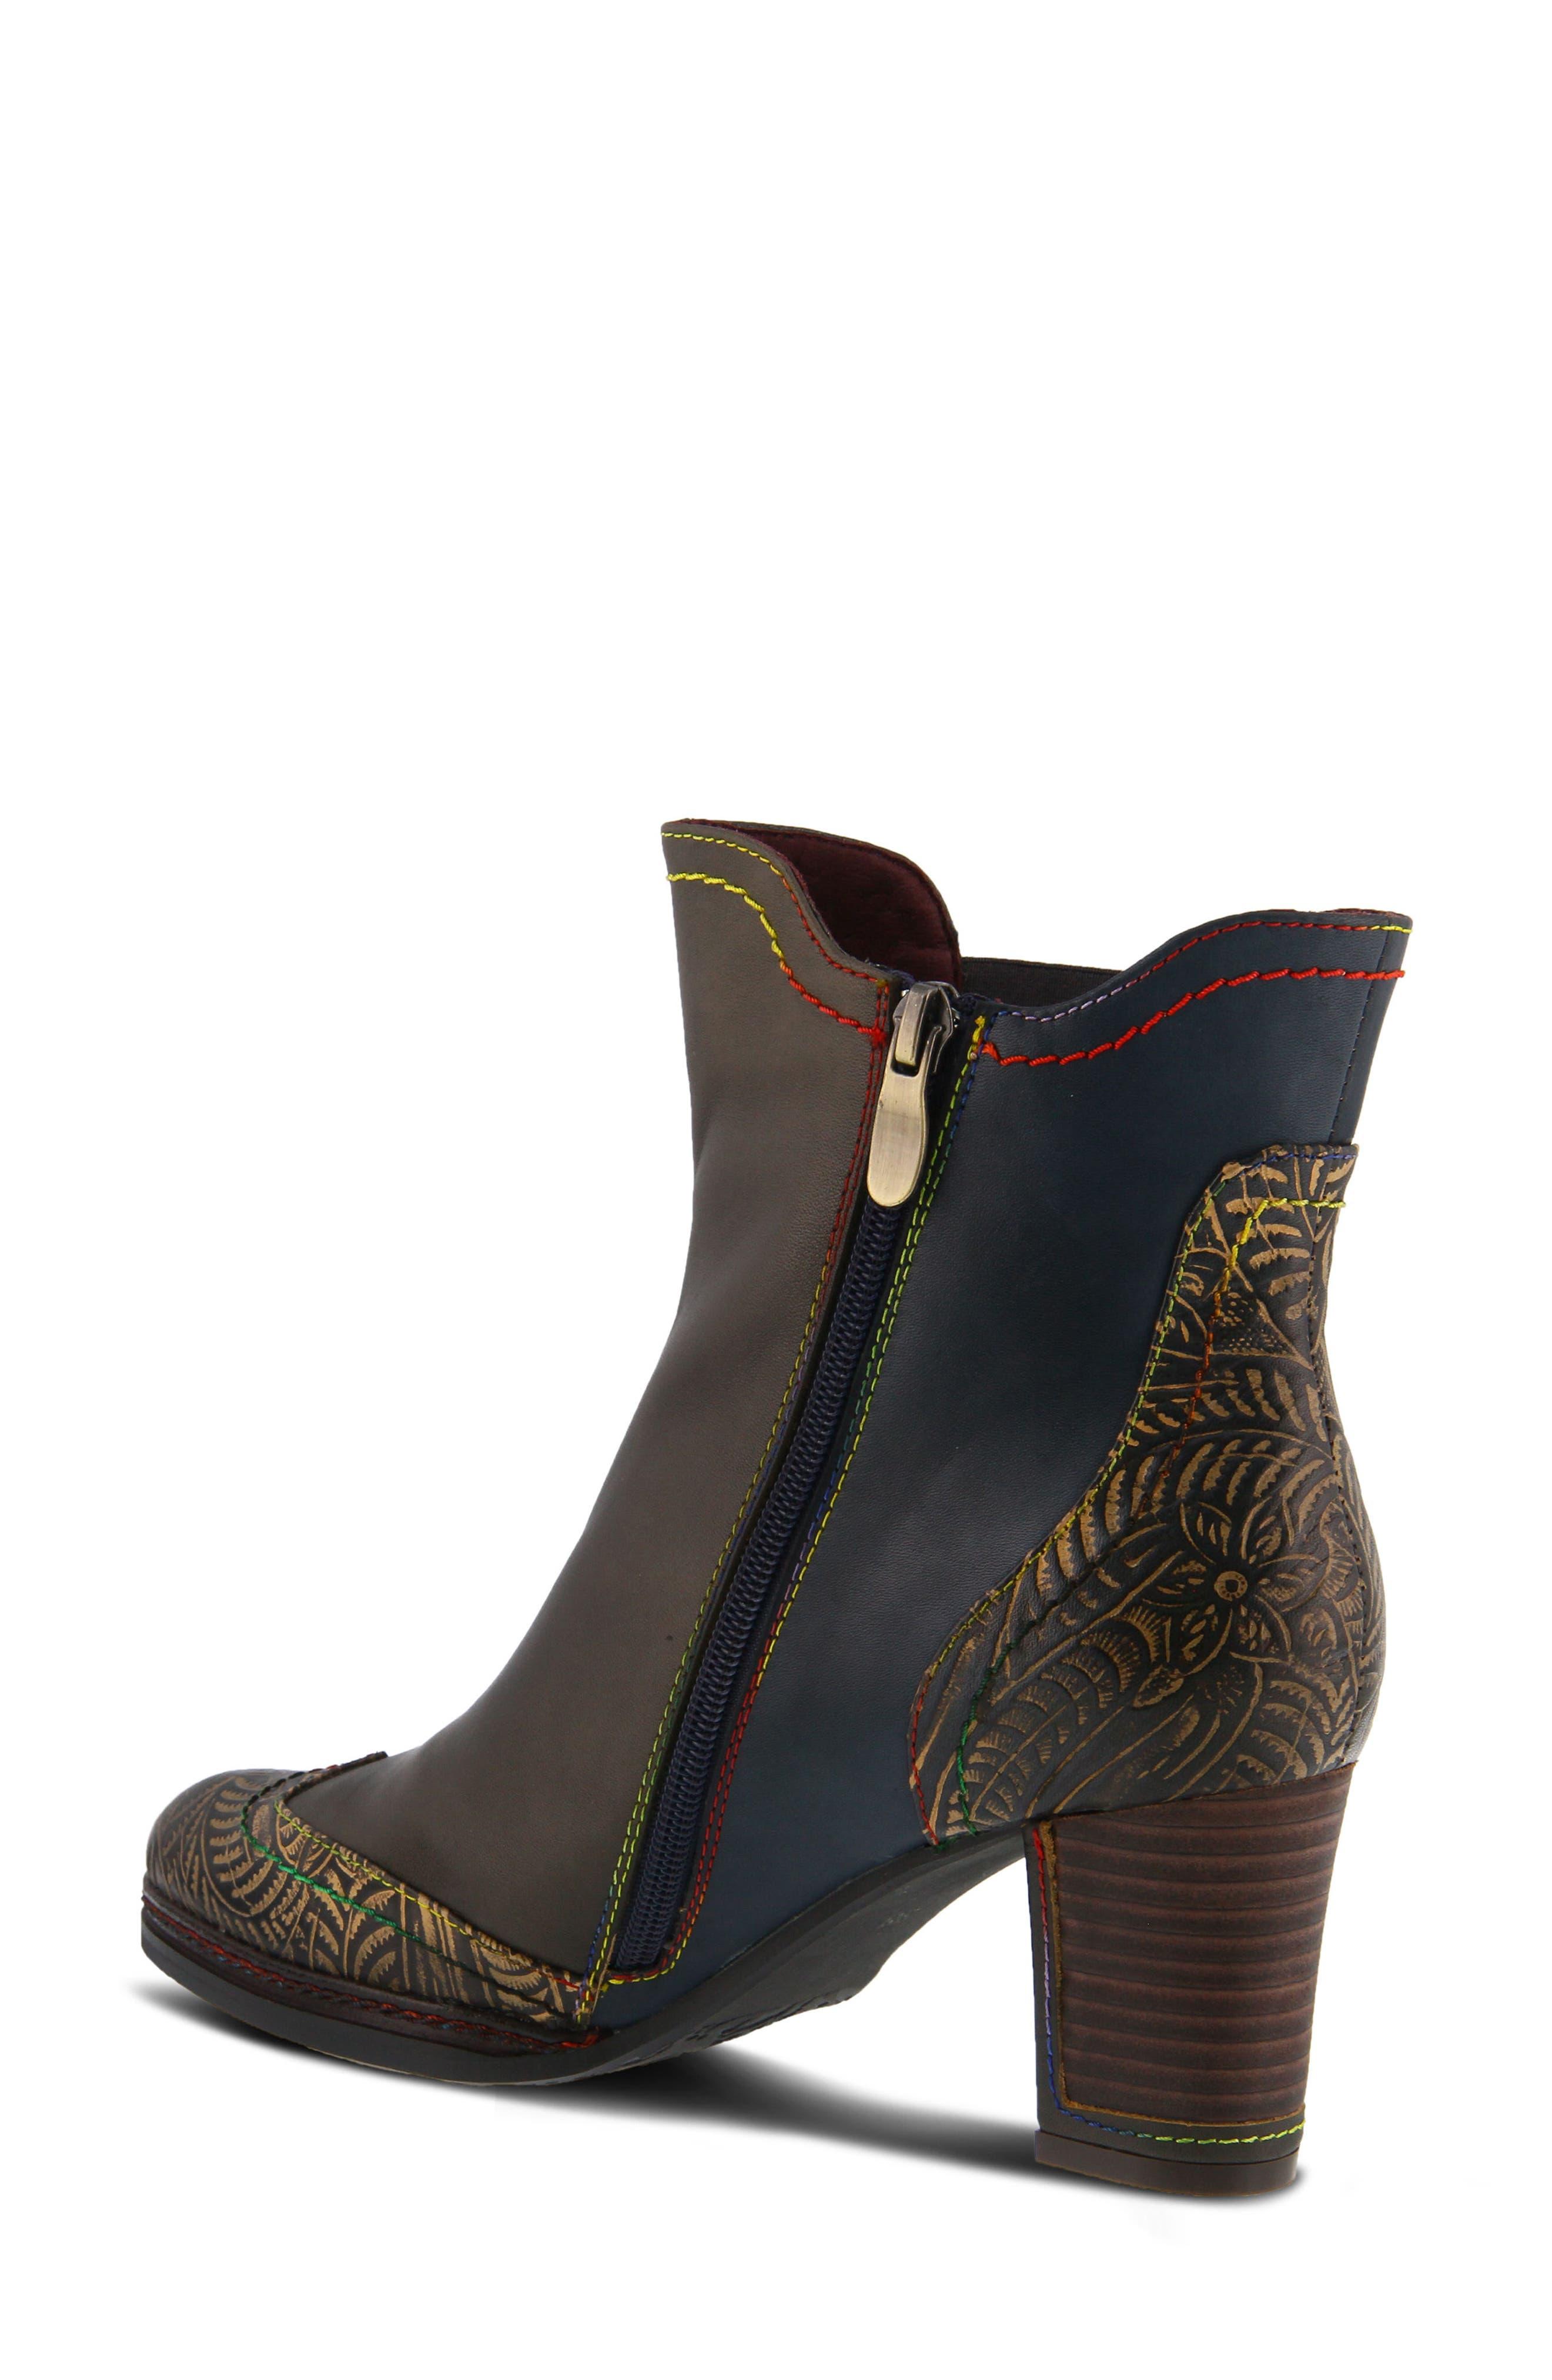 L'Artiste Santana Boot,                             Alternate thumbnail 2, color,                             Olive Green Leather